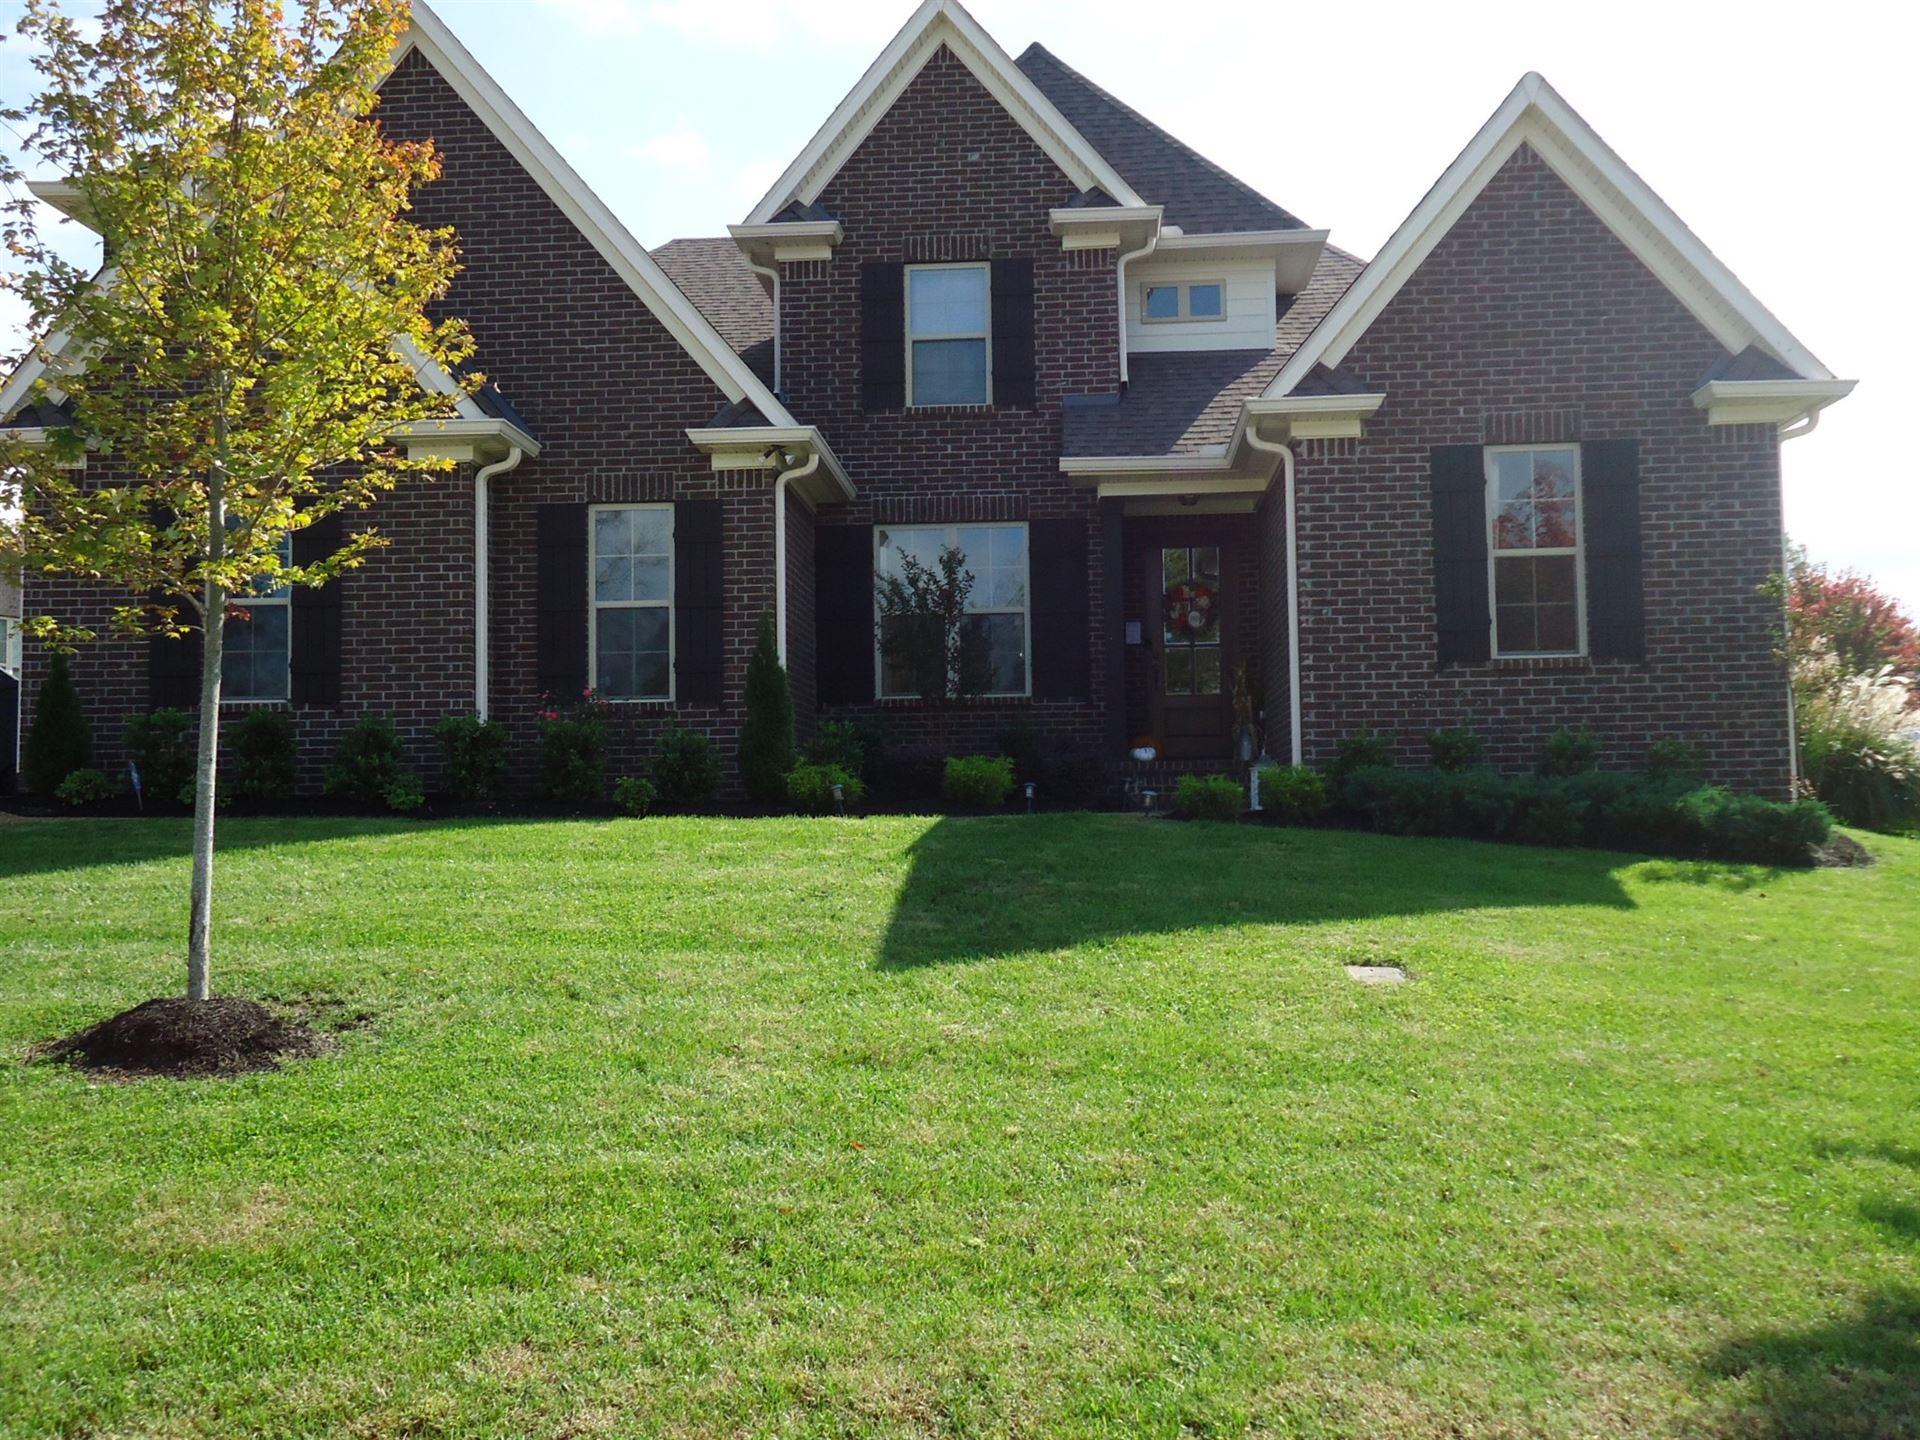 142 Circle Dr, Hendersonville, TN 37075 - MLS#: 2302397